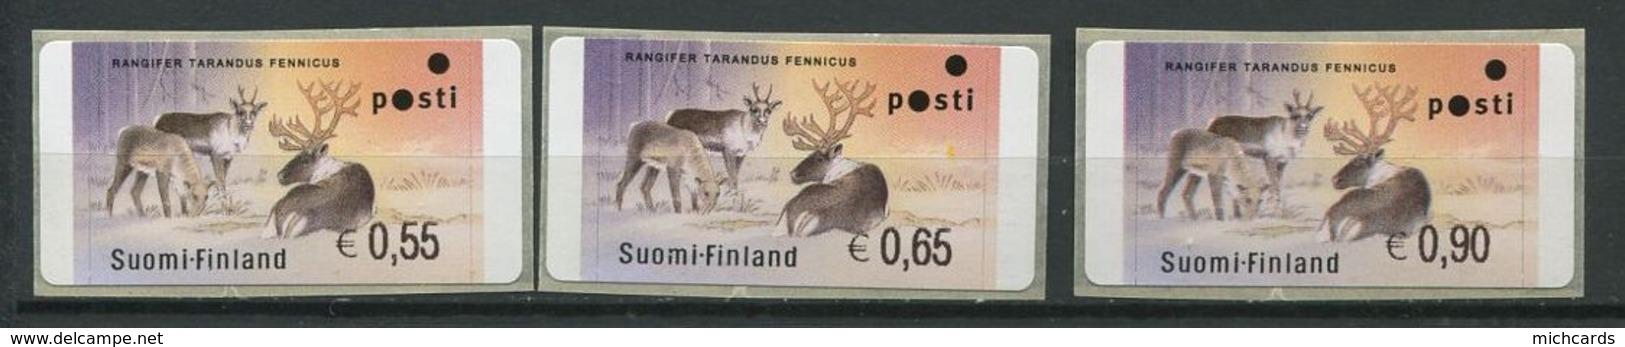 255 FINLANDE 2003 - Yvert 34 Distributeur Adhesif - Renne Sauvage - Neuf ** (MNH) Sans Trace De Charniere - Finland